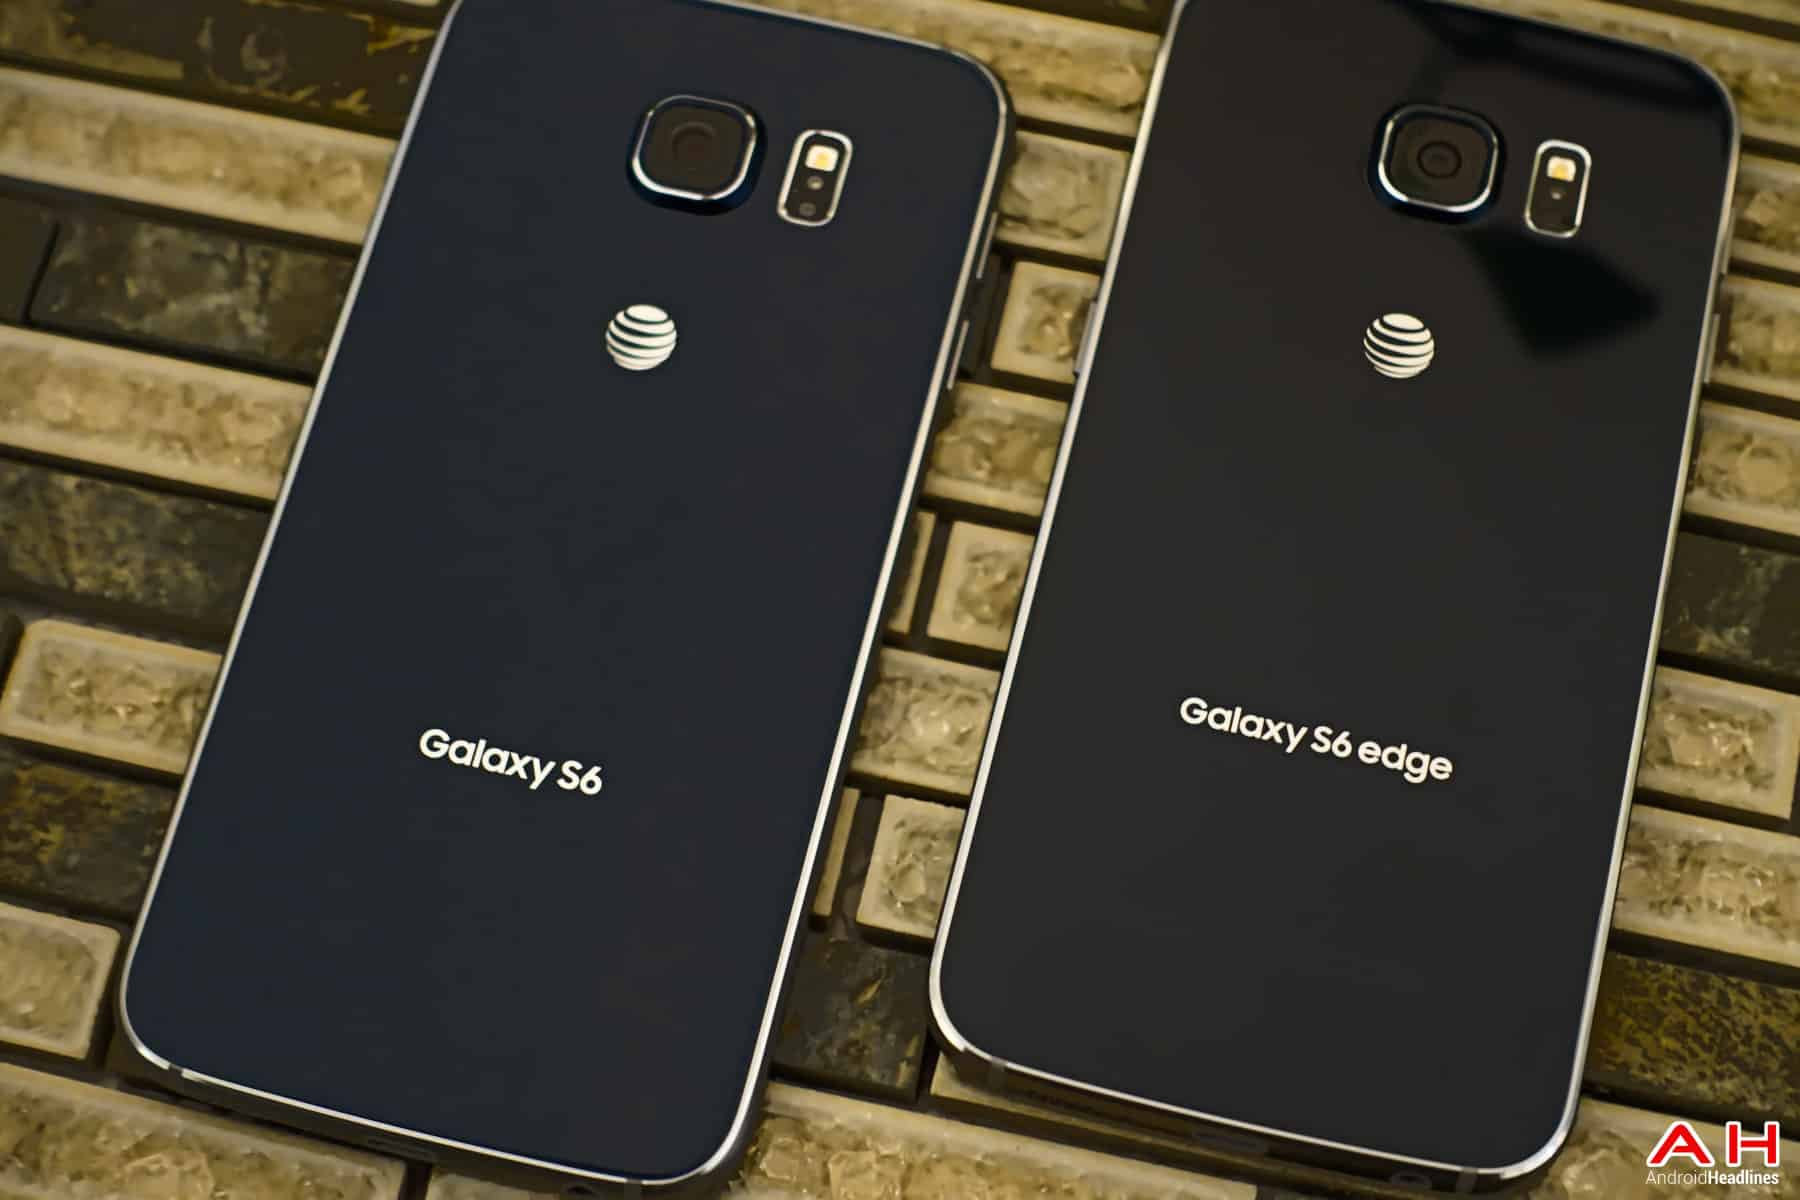 AH Samsung Galaxy S6 & Edge May 3rd - Chris-10